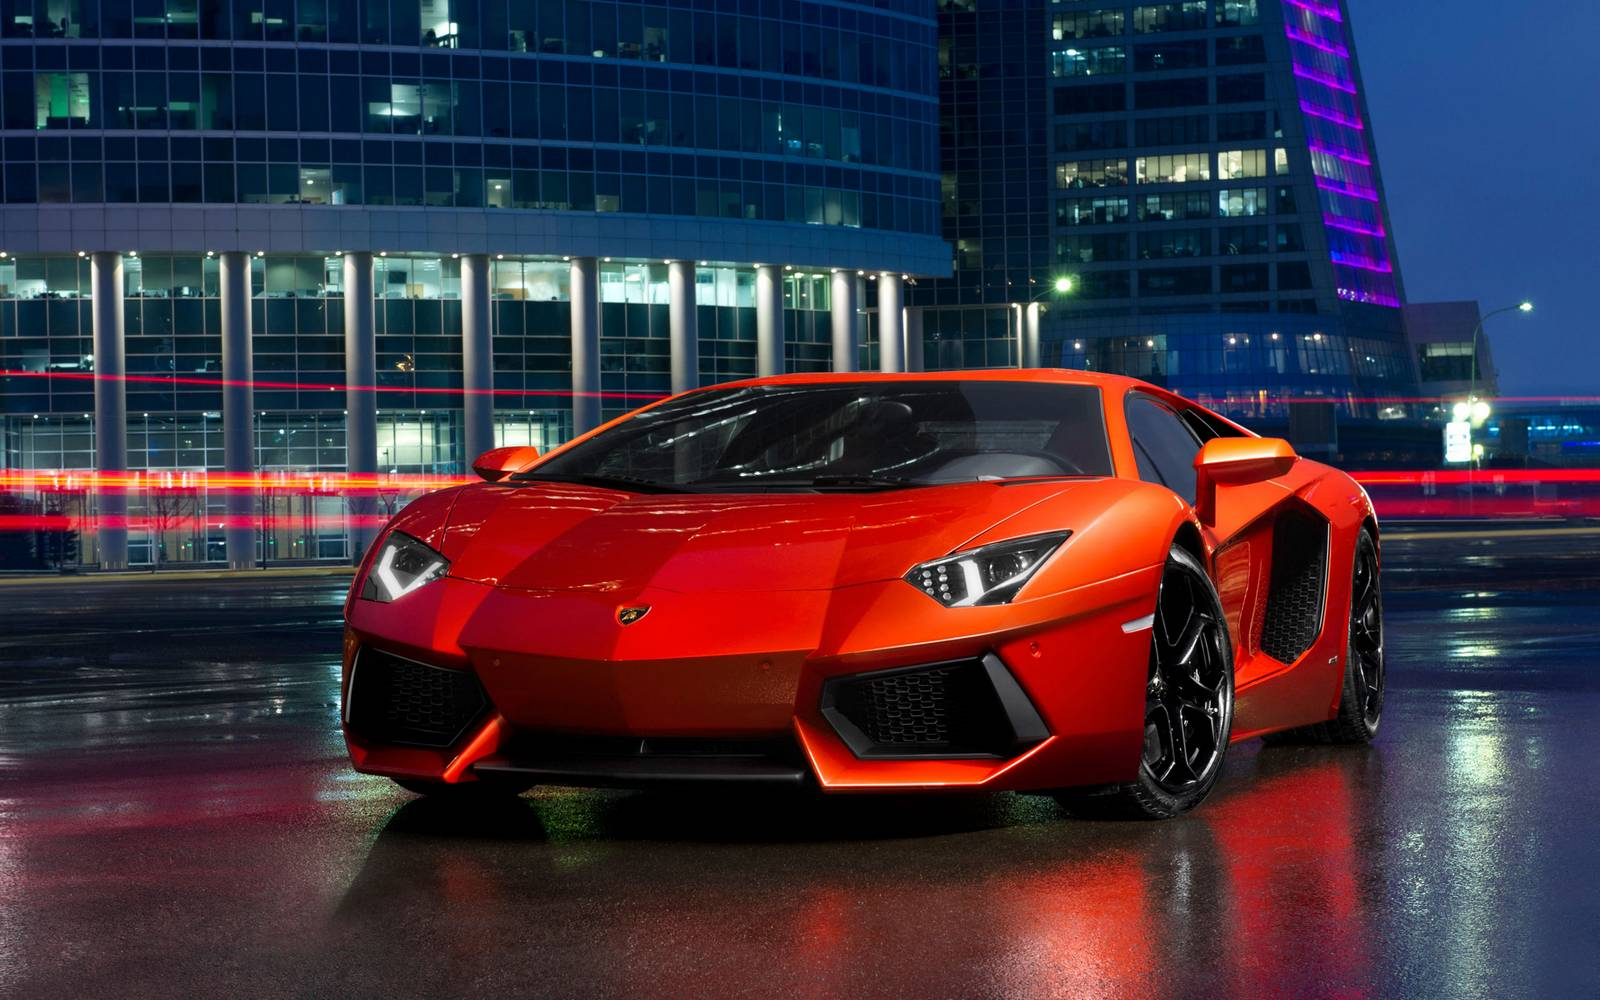 Lamborghini Aventador LP700-4 Nazionale to Debut in Beijing Alongside the Huracan